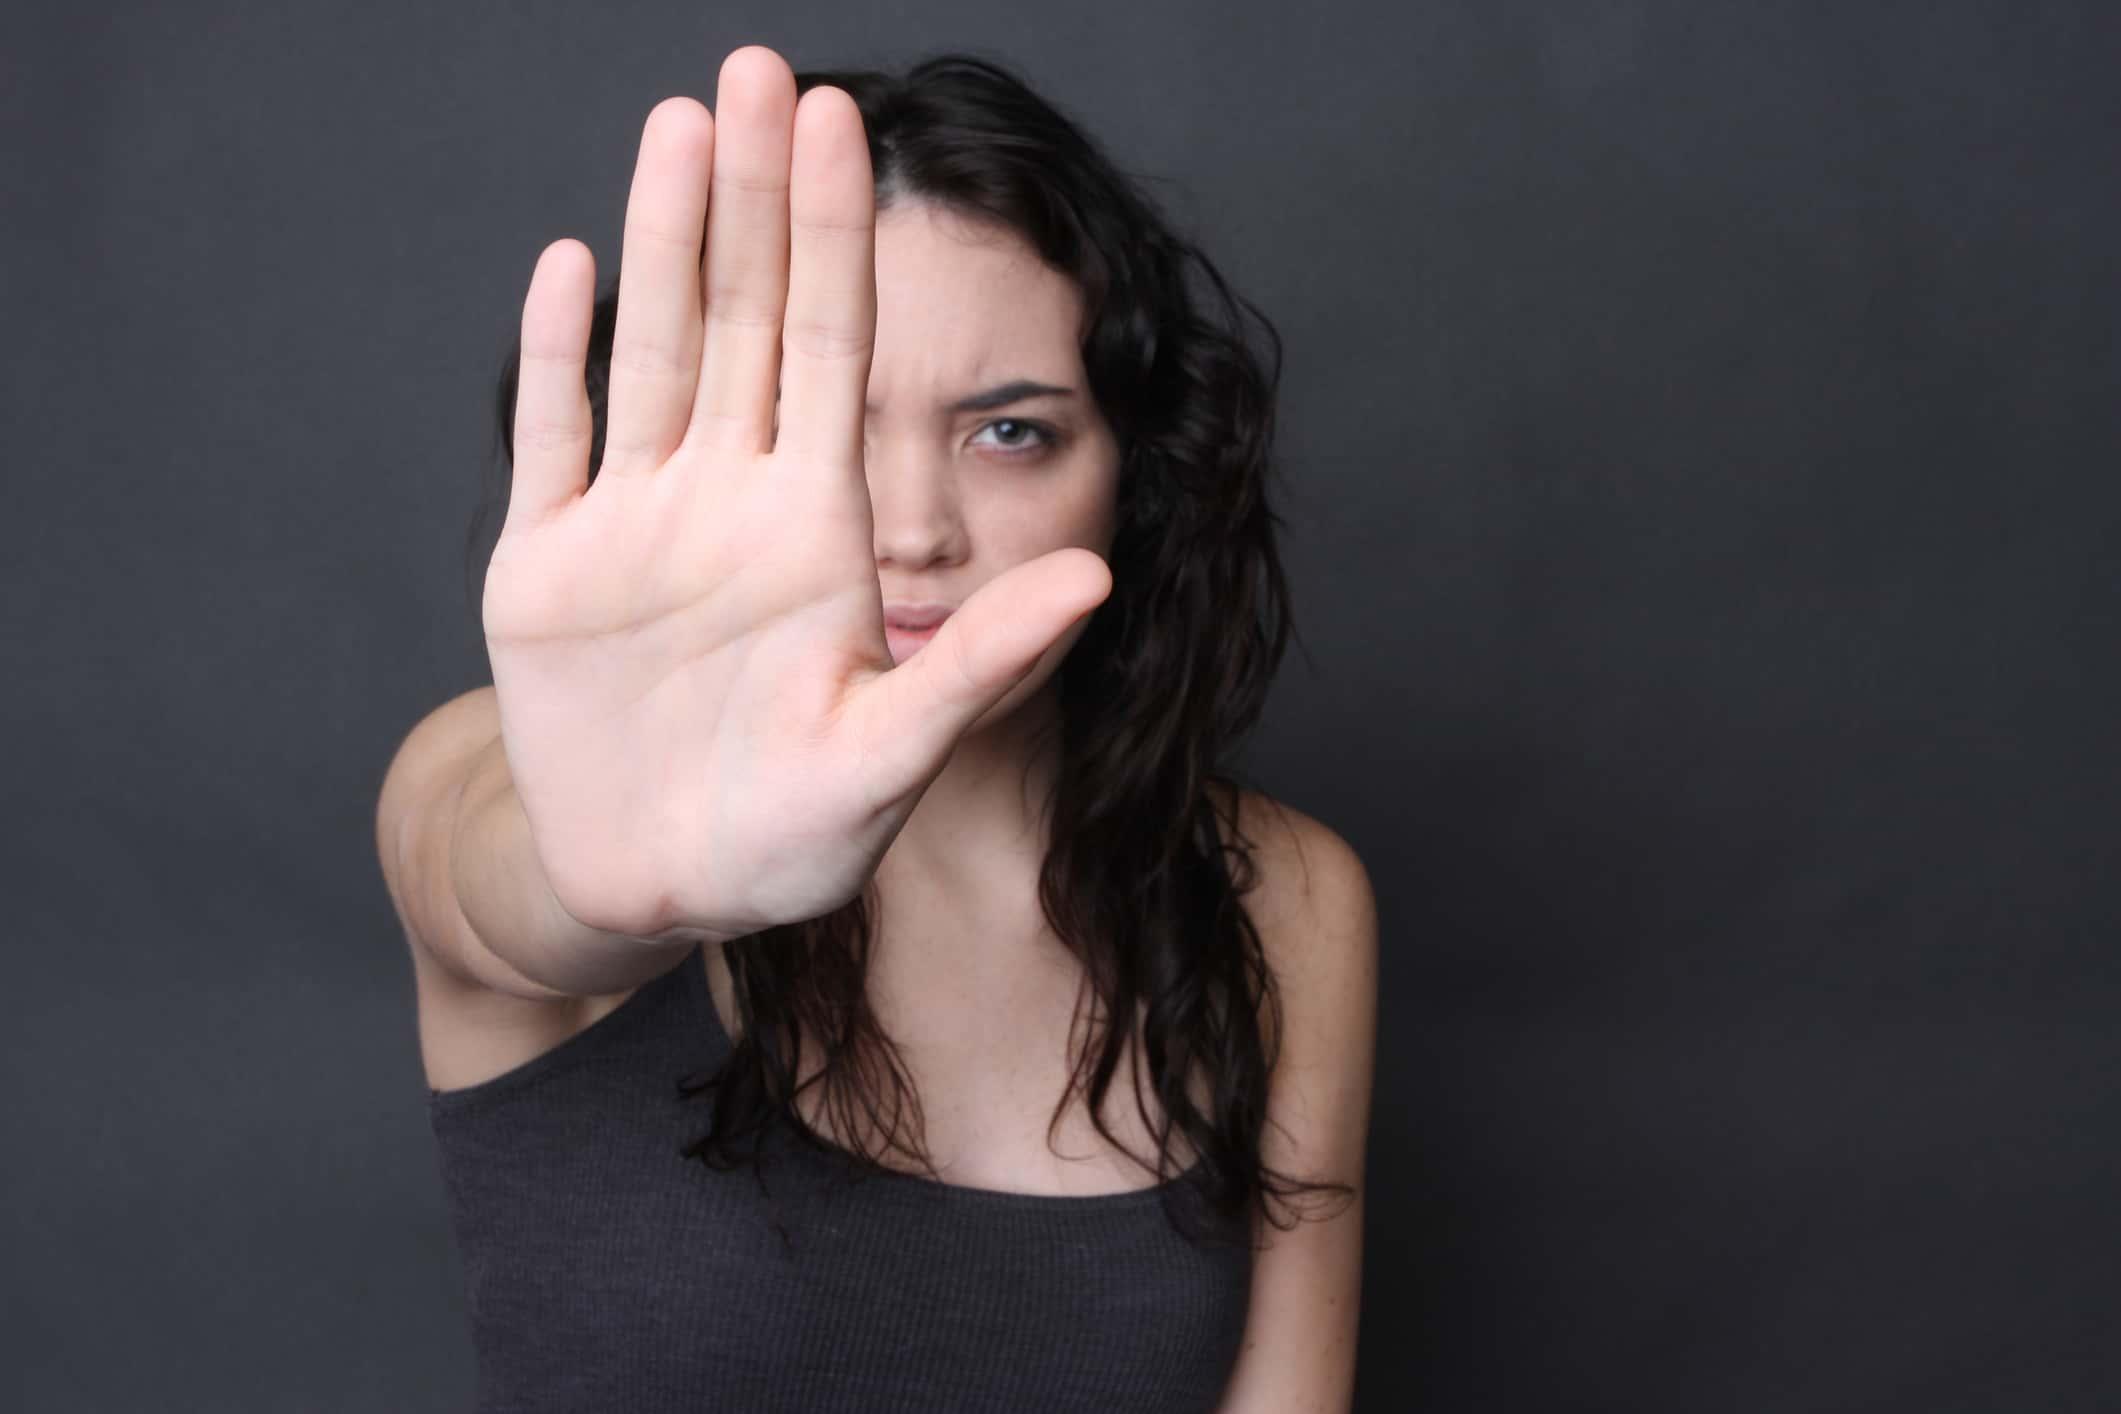 An angry looking girl in self defense gesture.